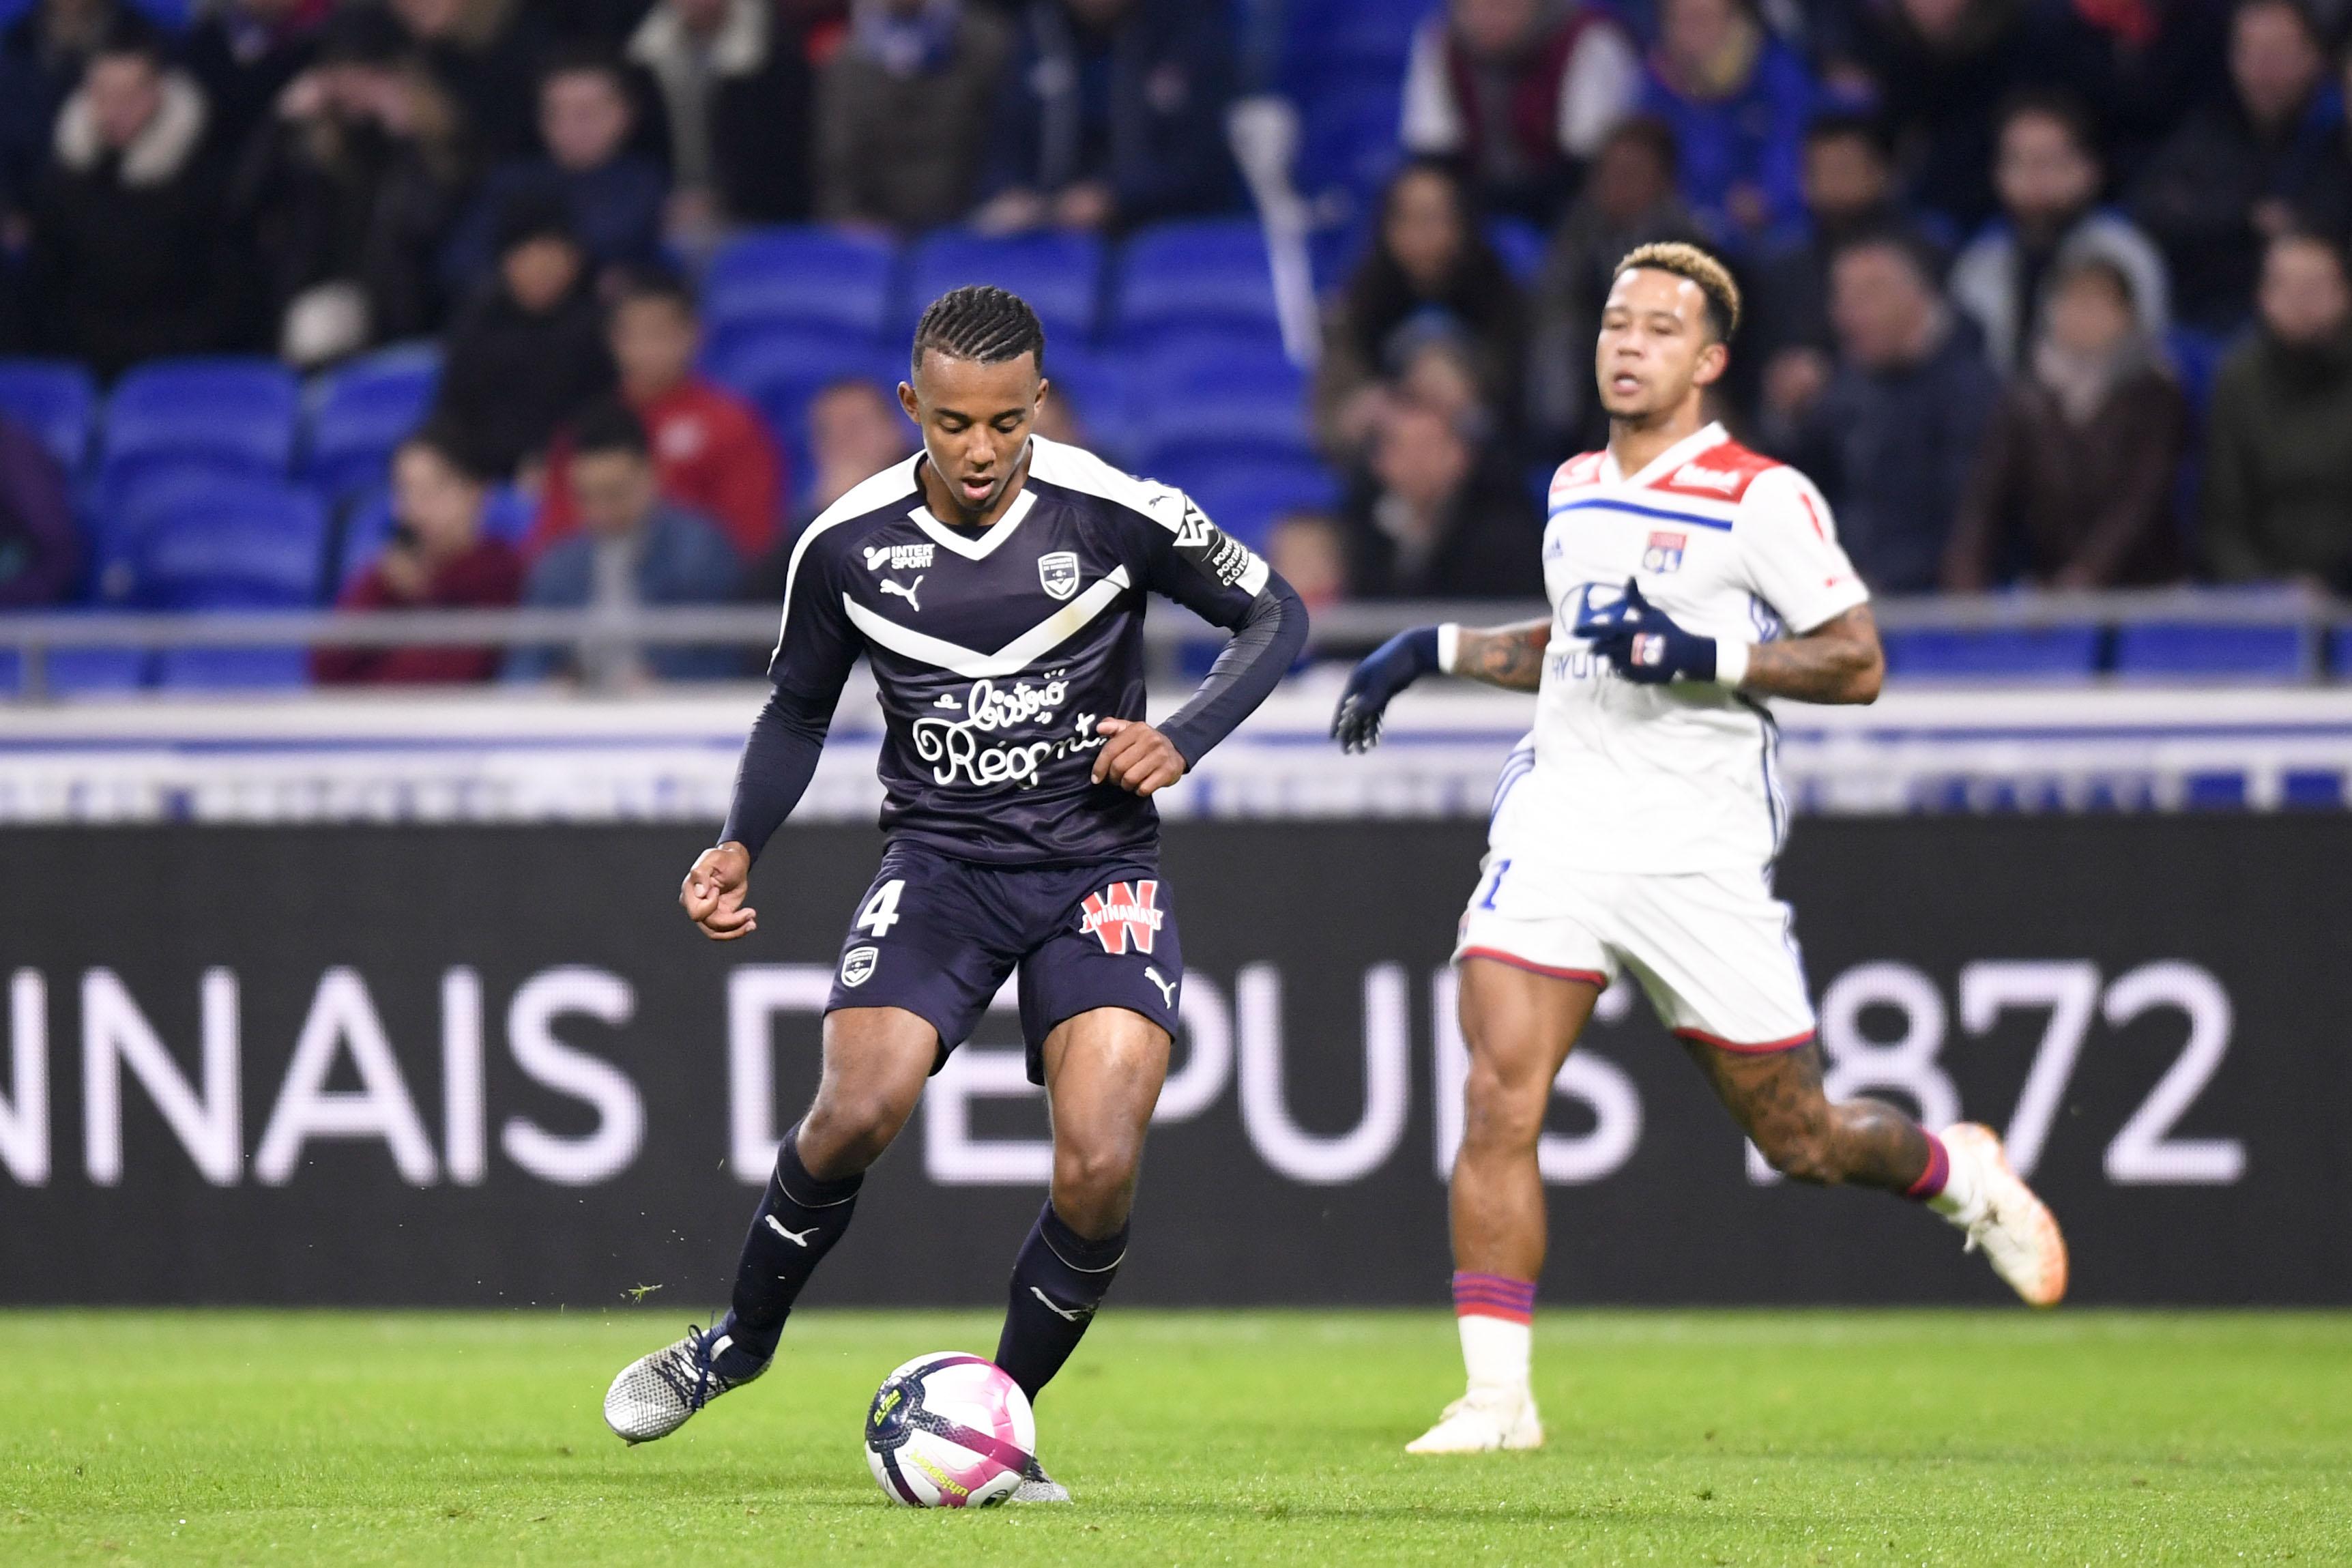 Football - Ligue 1 - Jules Koundé, le jeune taulier des Girondins